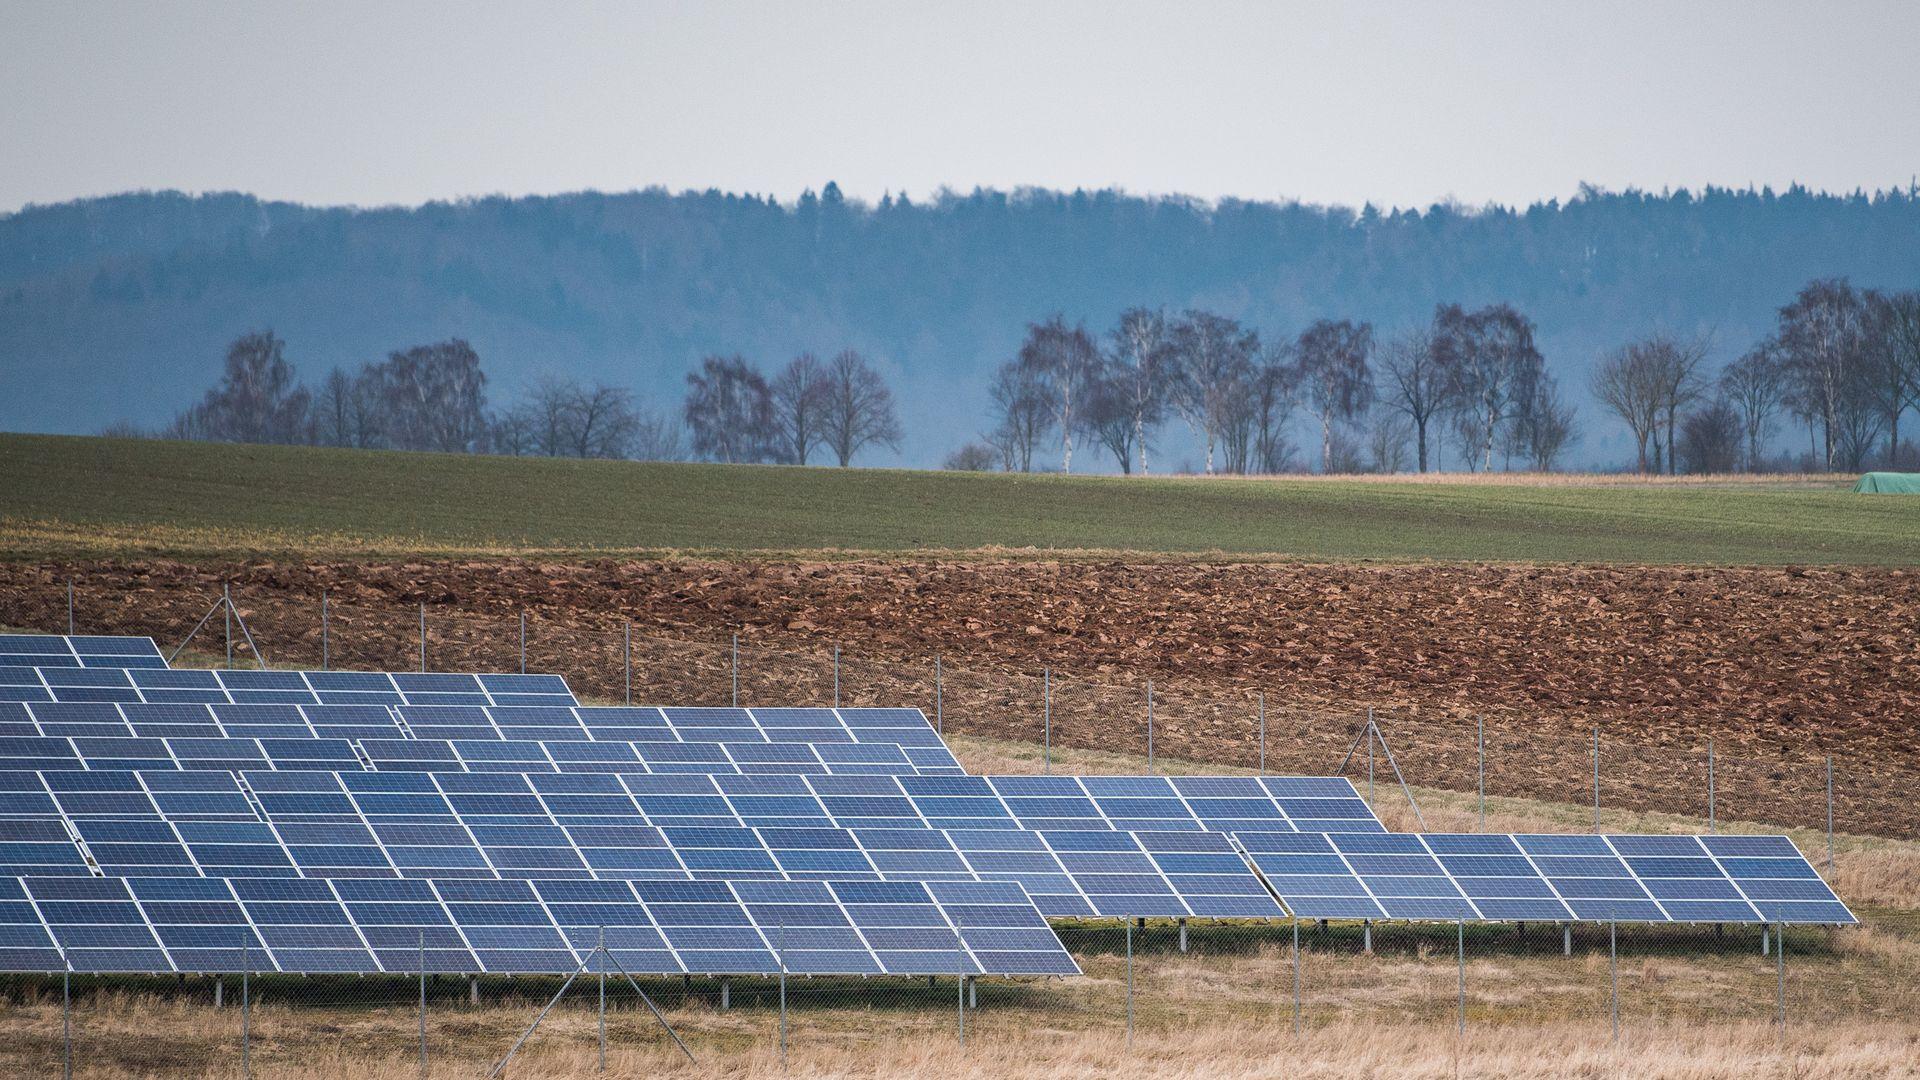 Congress rebuffs Trump on green energy cutbacks - Axios